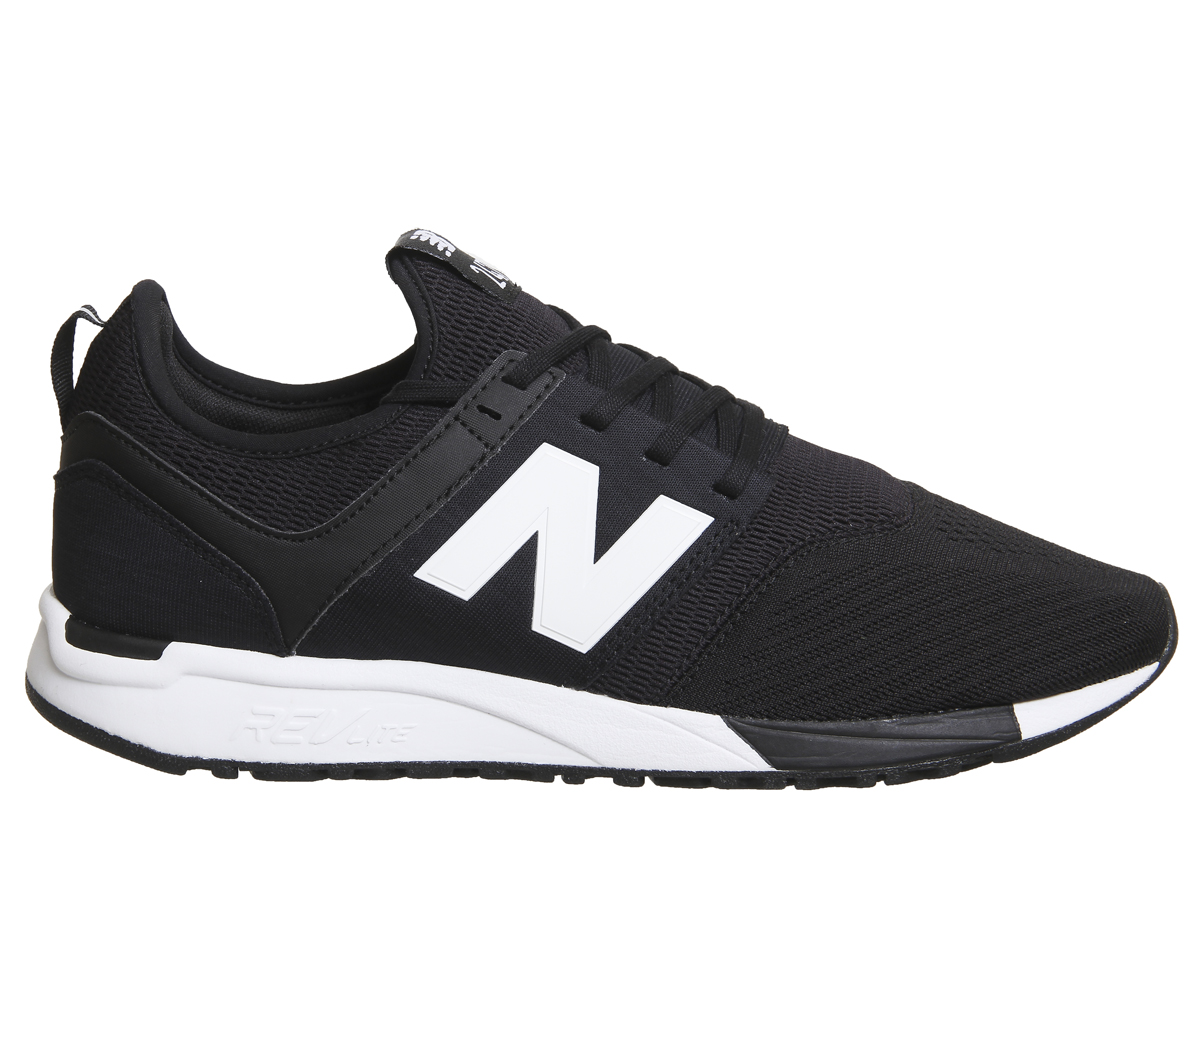 New Balance 247 Sneaker Uomo MRL247CK Black